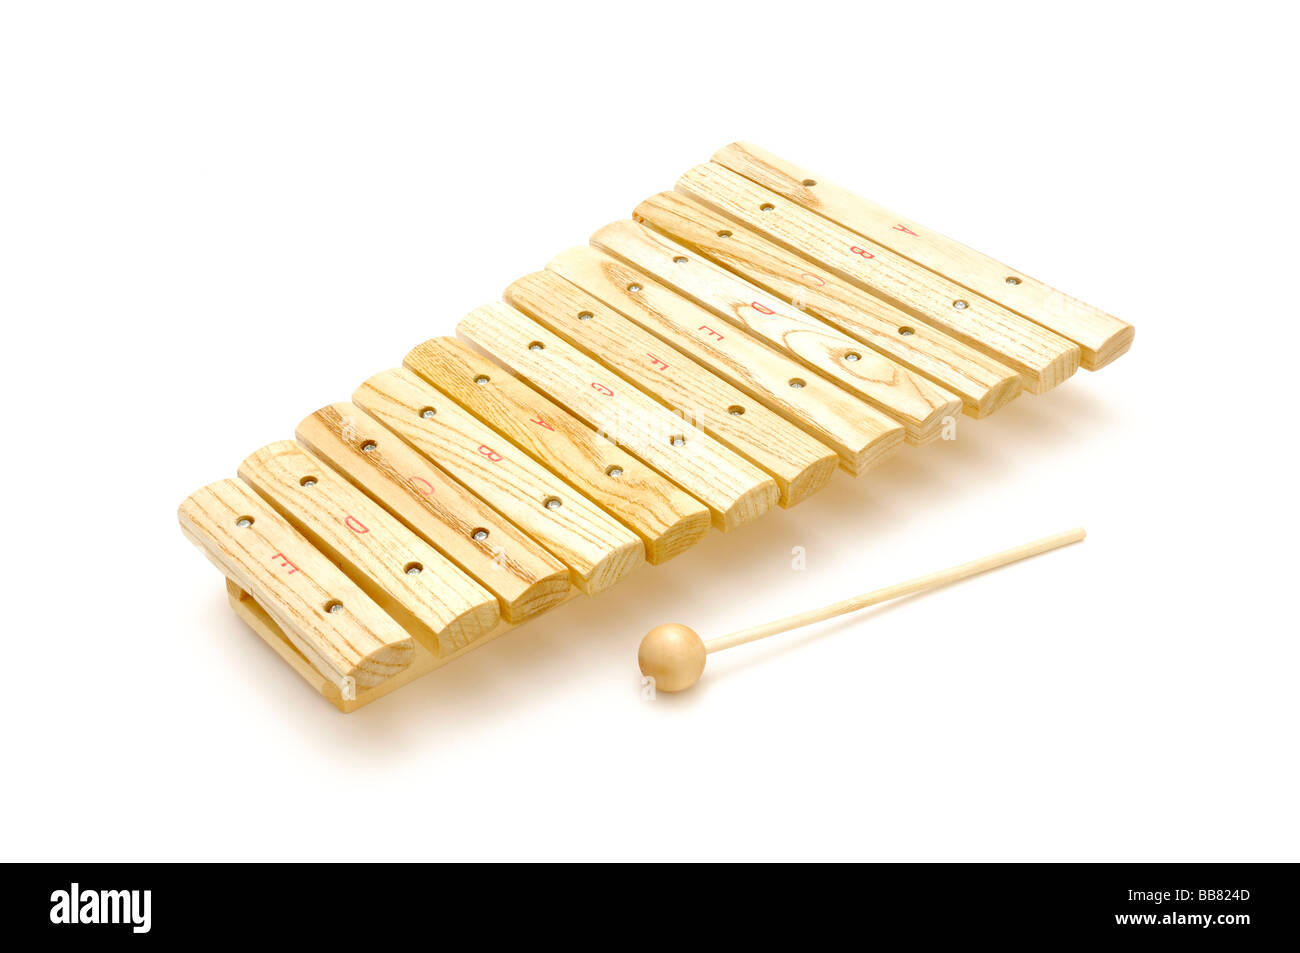 Hölzerne Instrument, Xylophon Stockbild